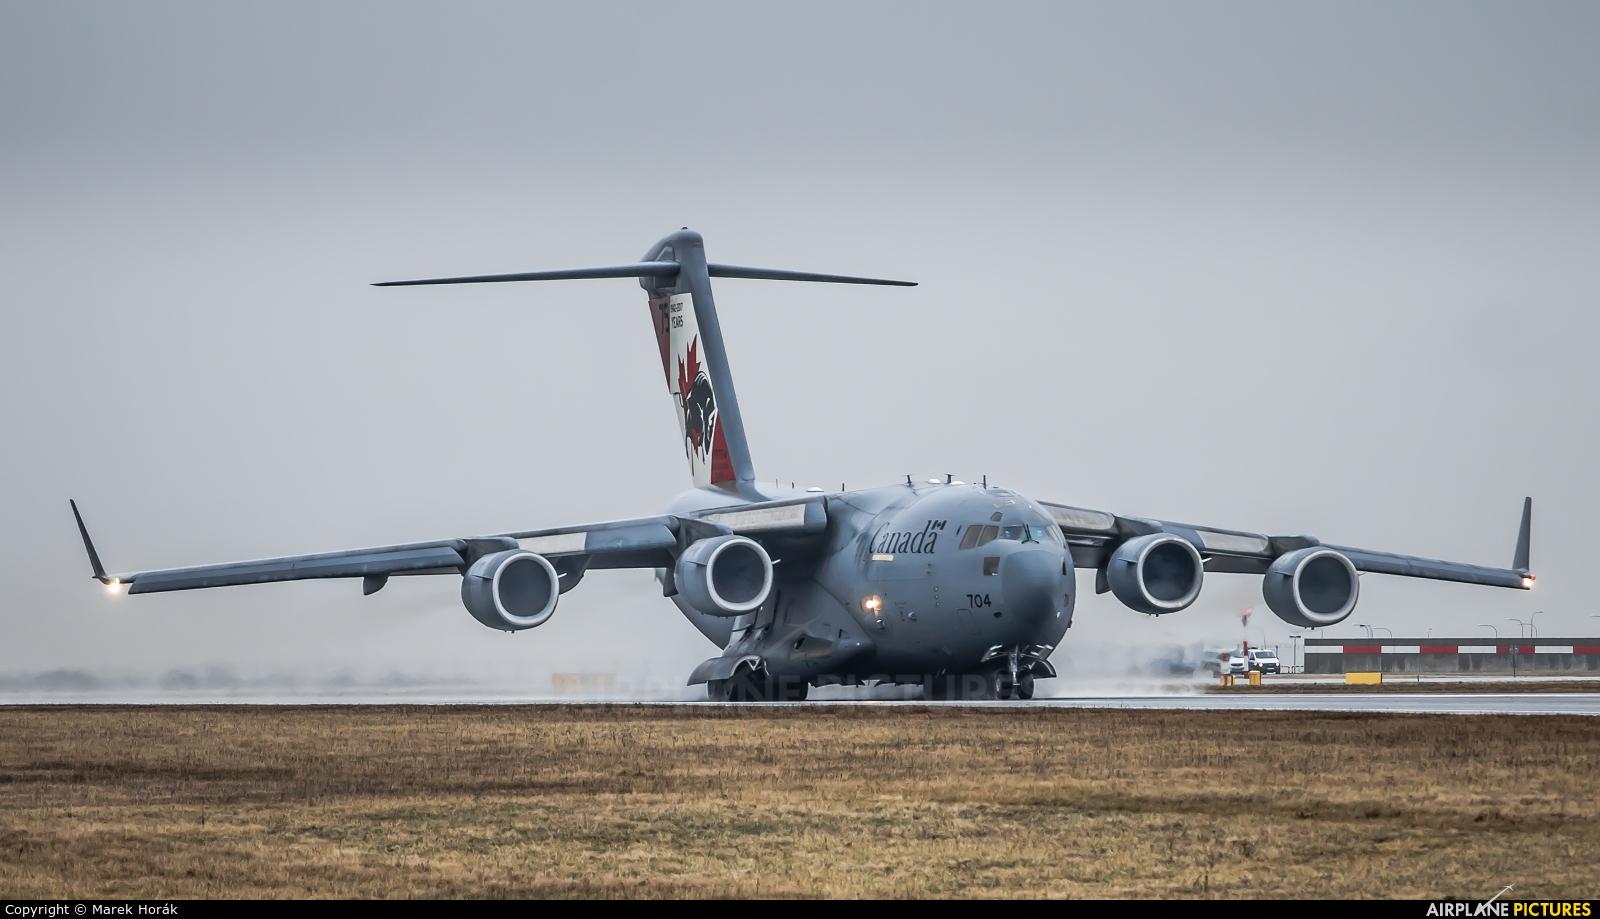 Canada - Air Force 177704 aircraft at Prague - Václav Havel